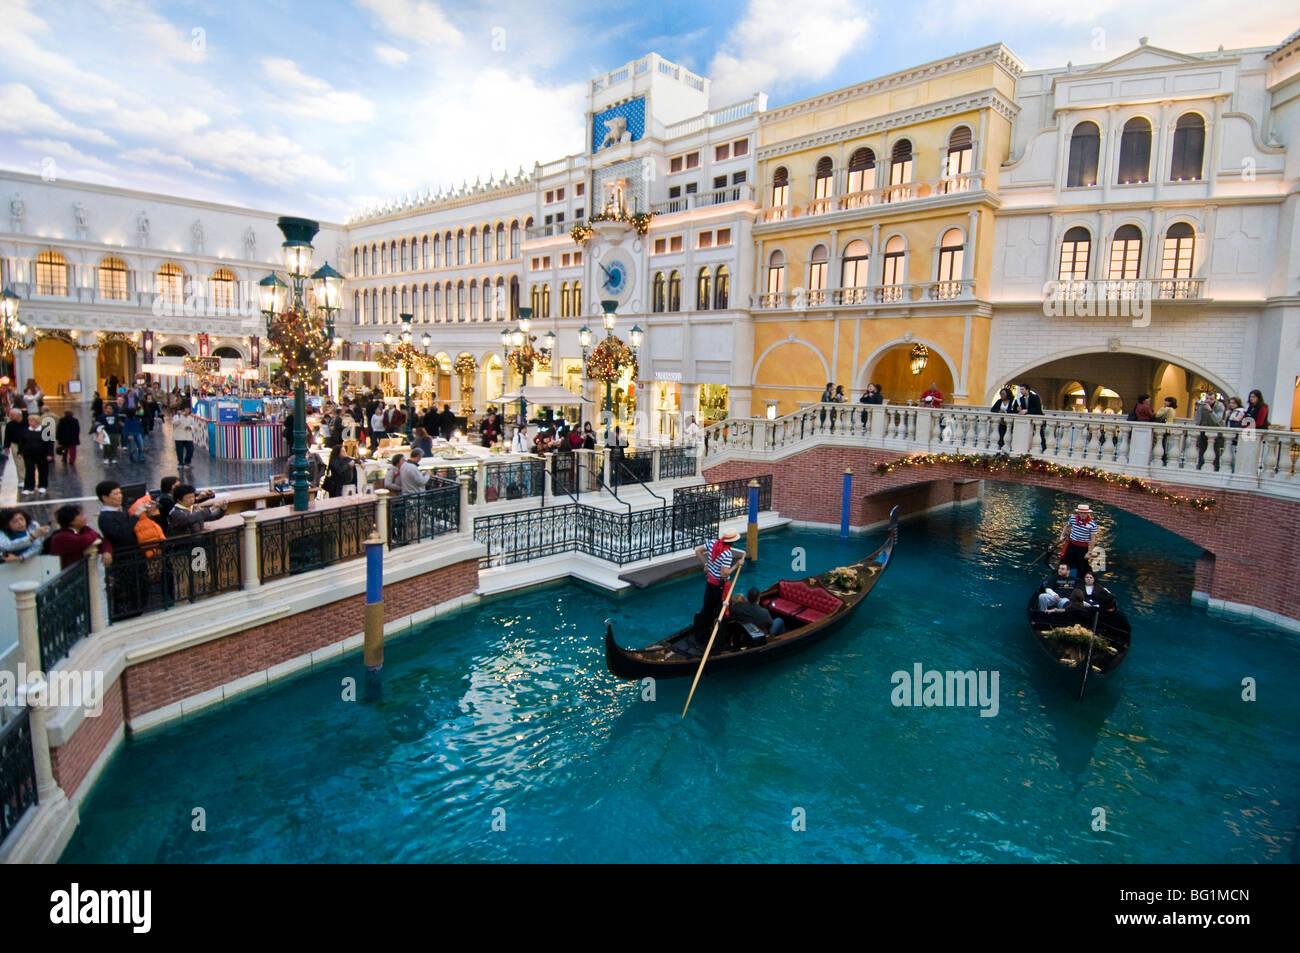 Gondola Ride Las Vegas Venetian Stock Photos  Gondola Ride Las - Map of las vegas venetian